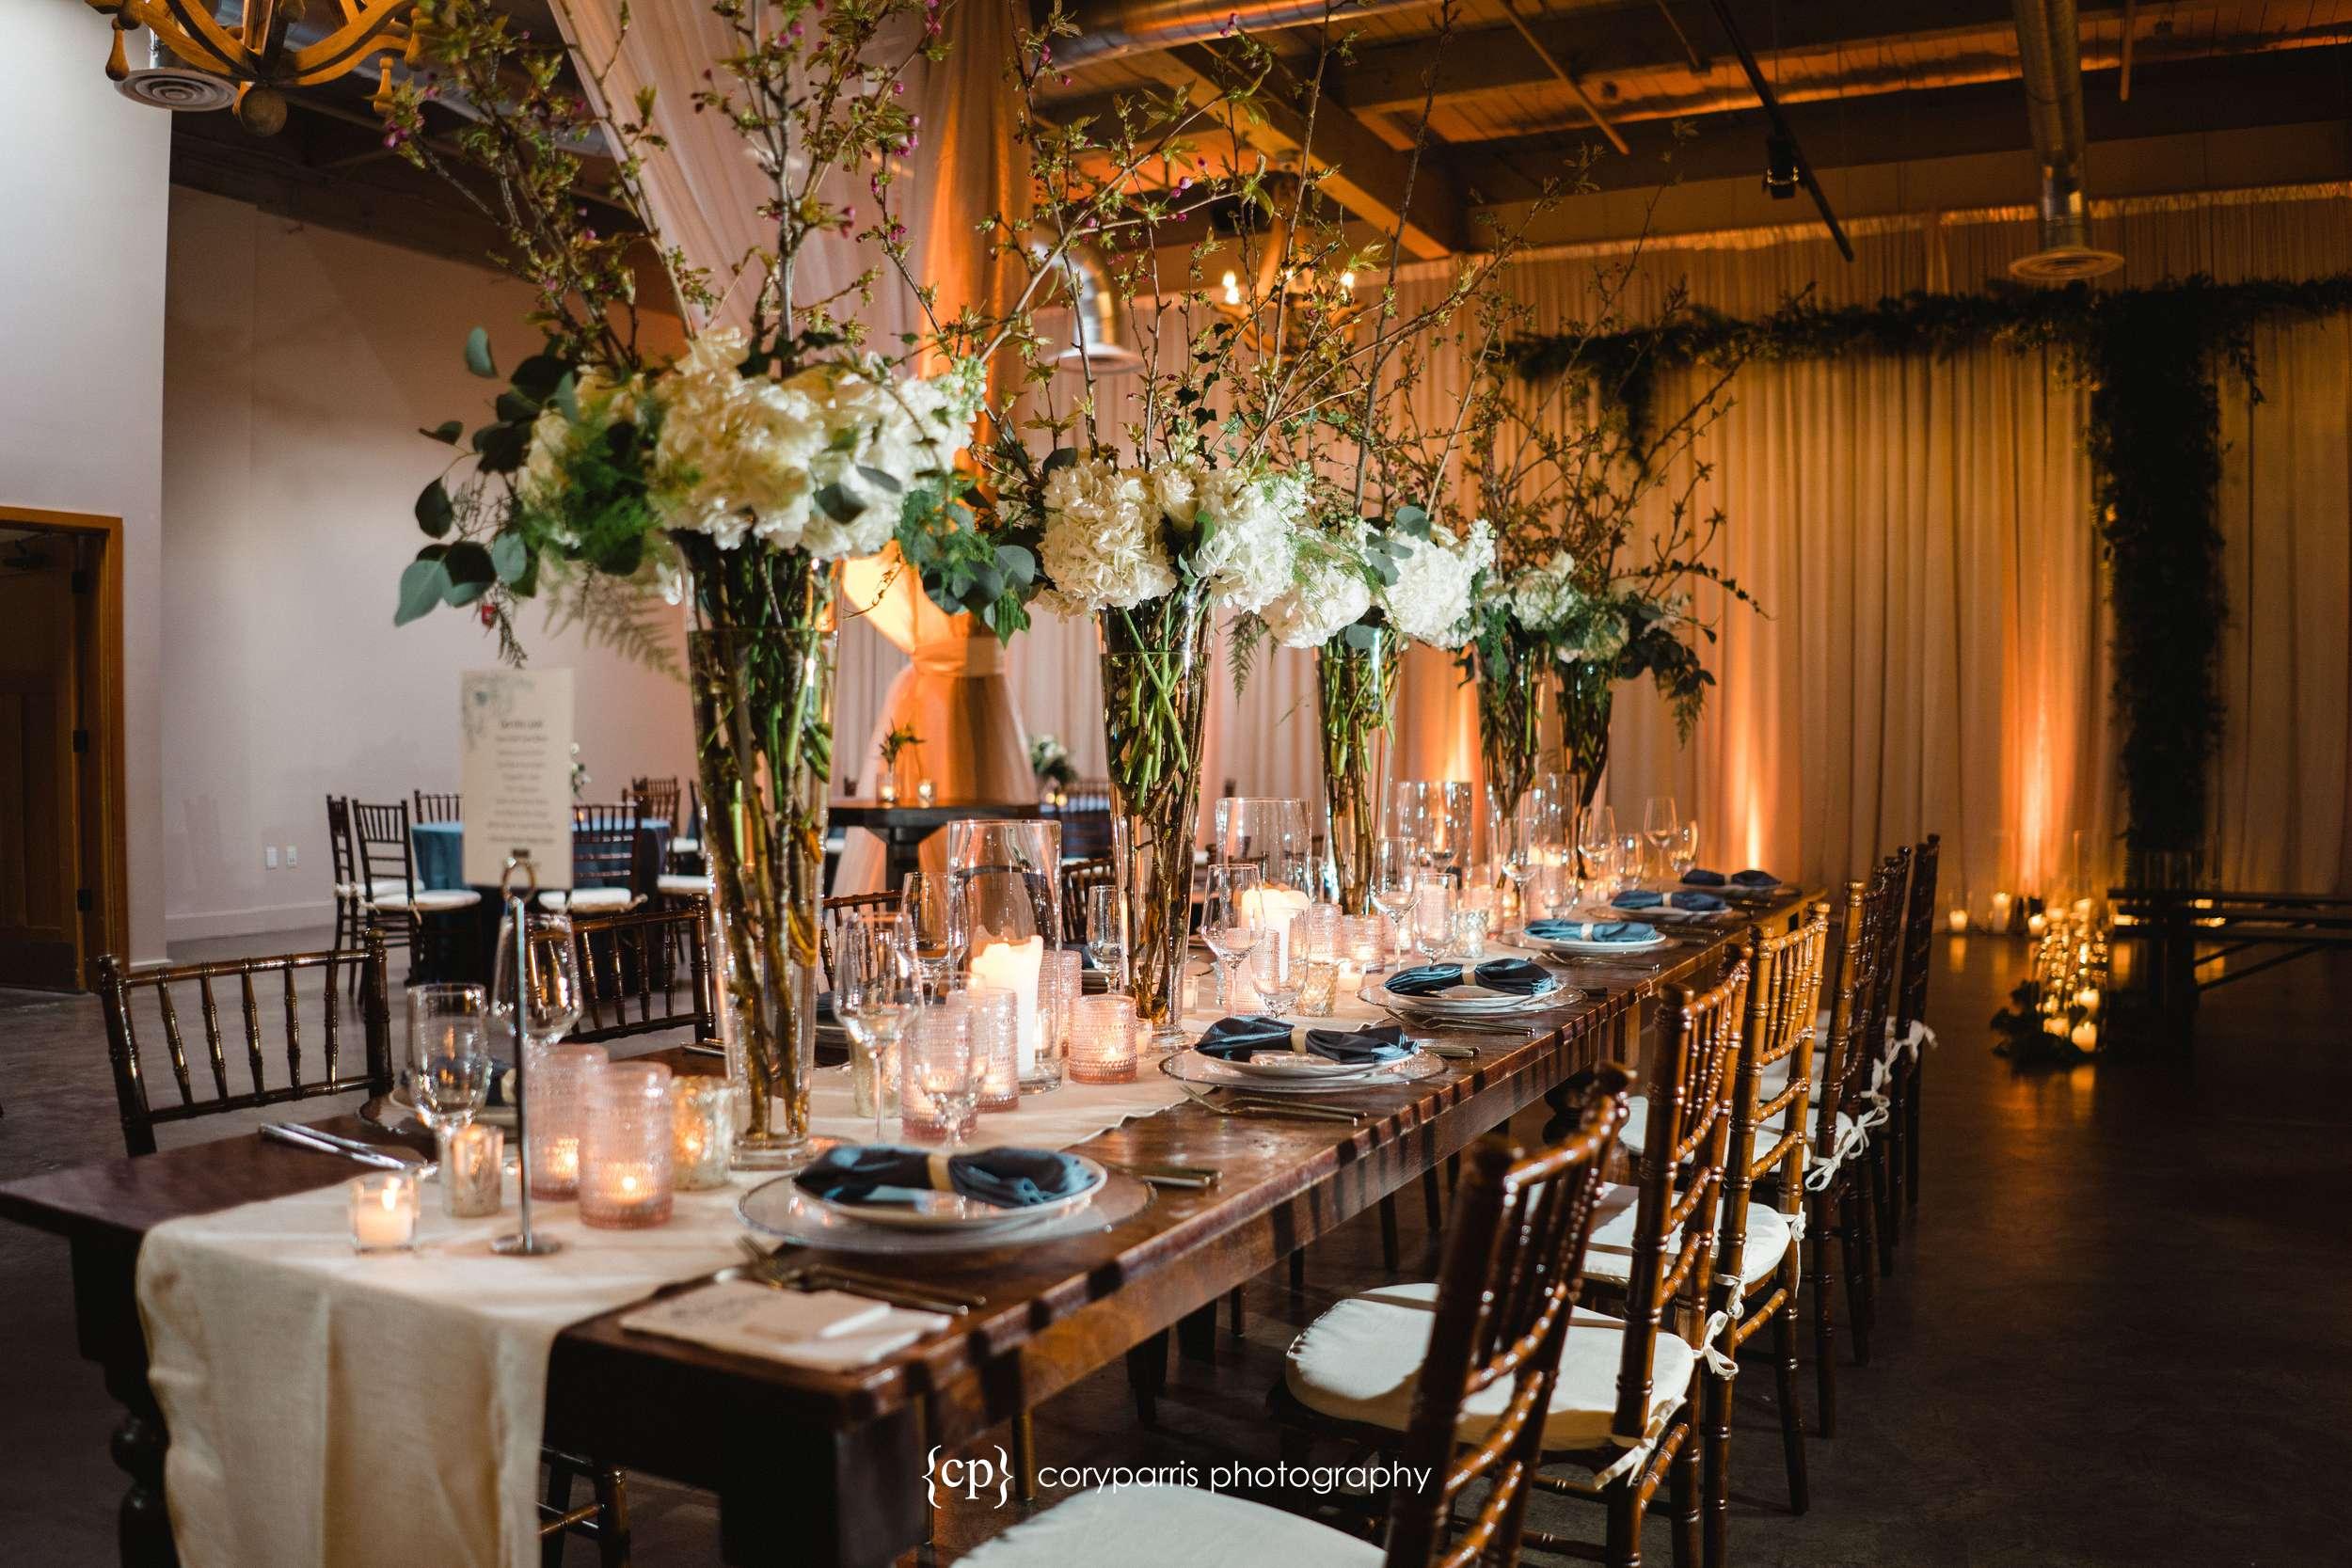 005-the-foundry-wedding-venue-seattle.jpg